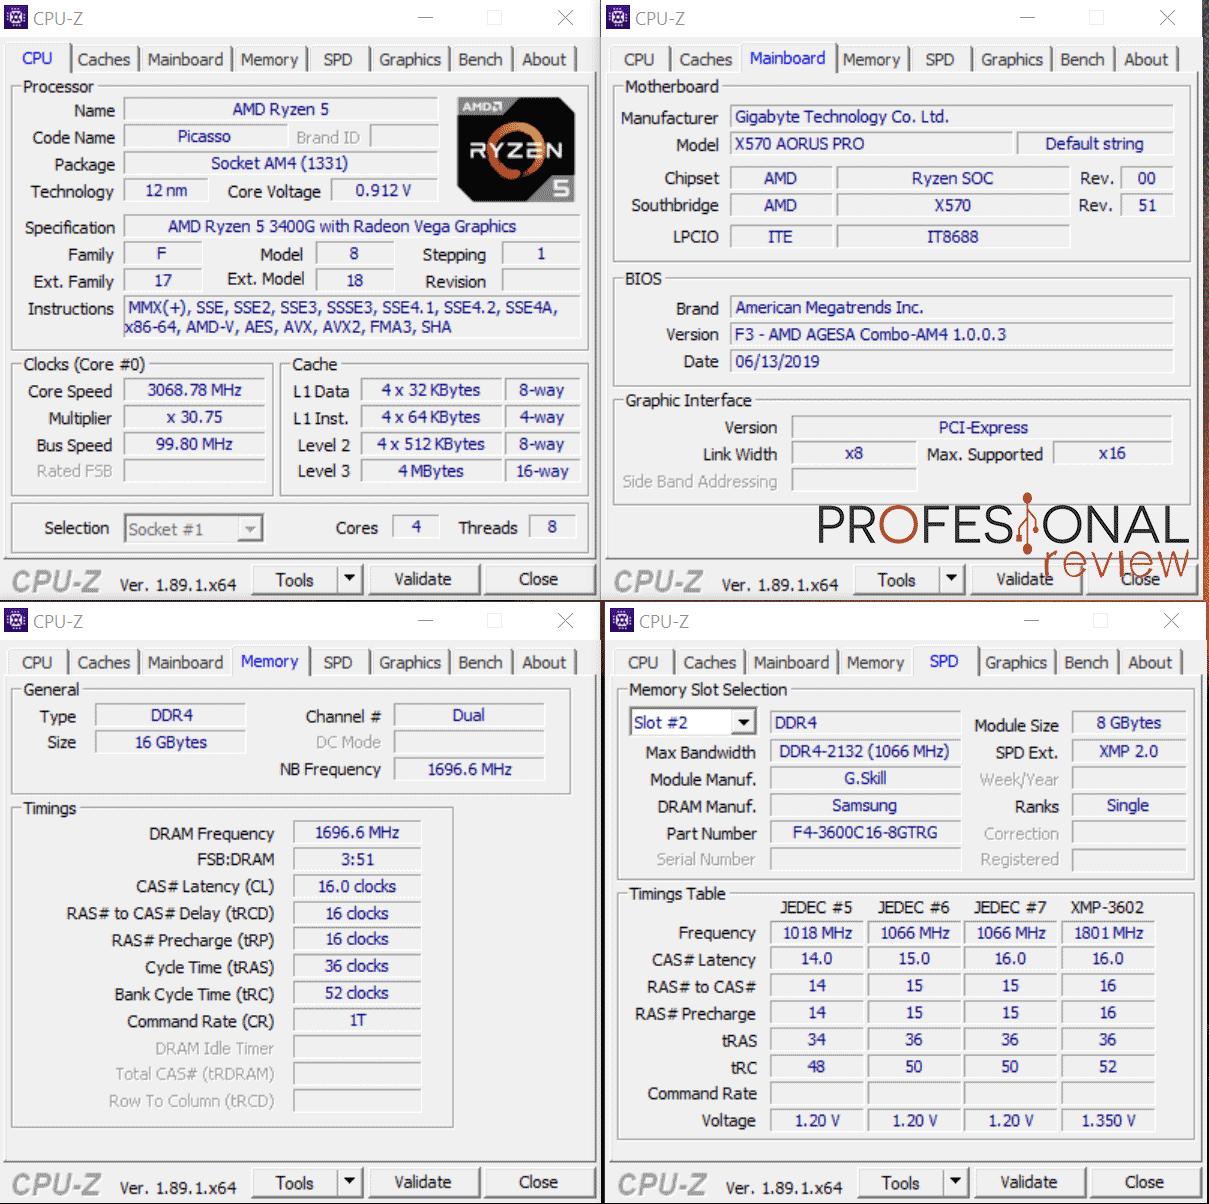 AMD Ryzen 5 3400G Review